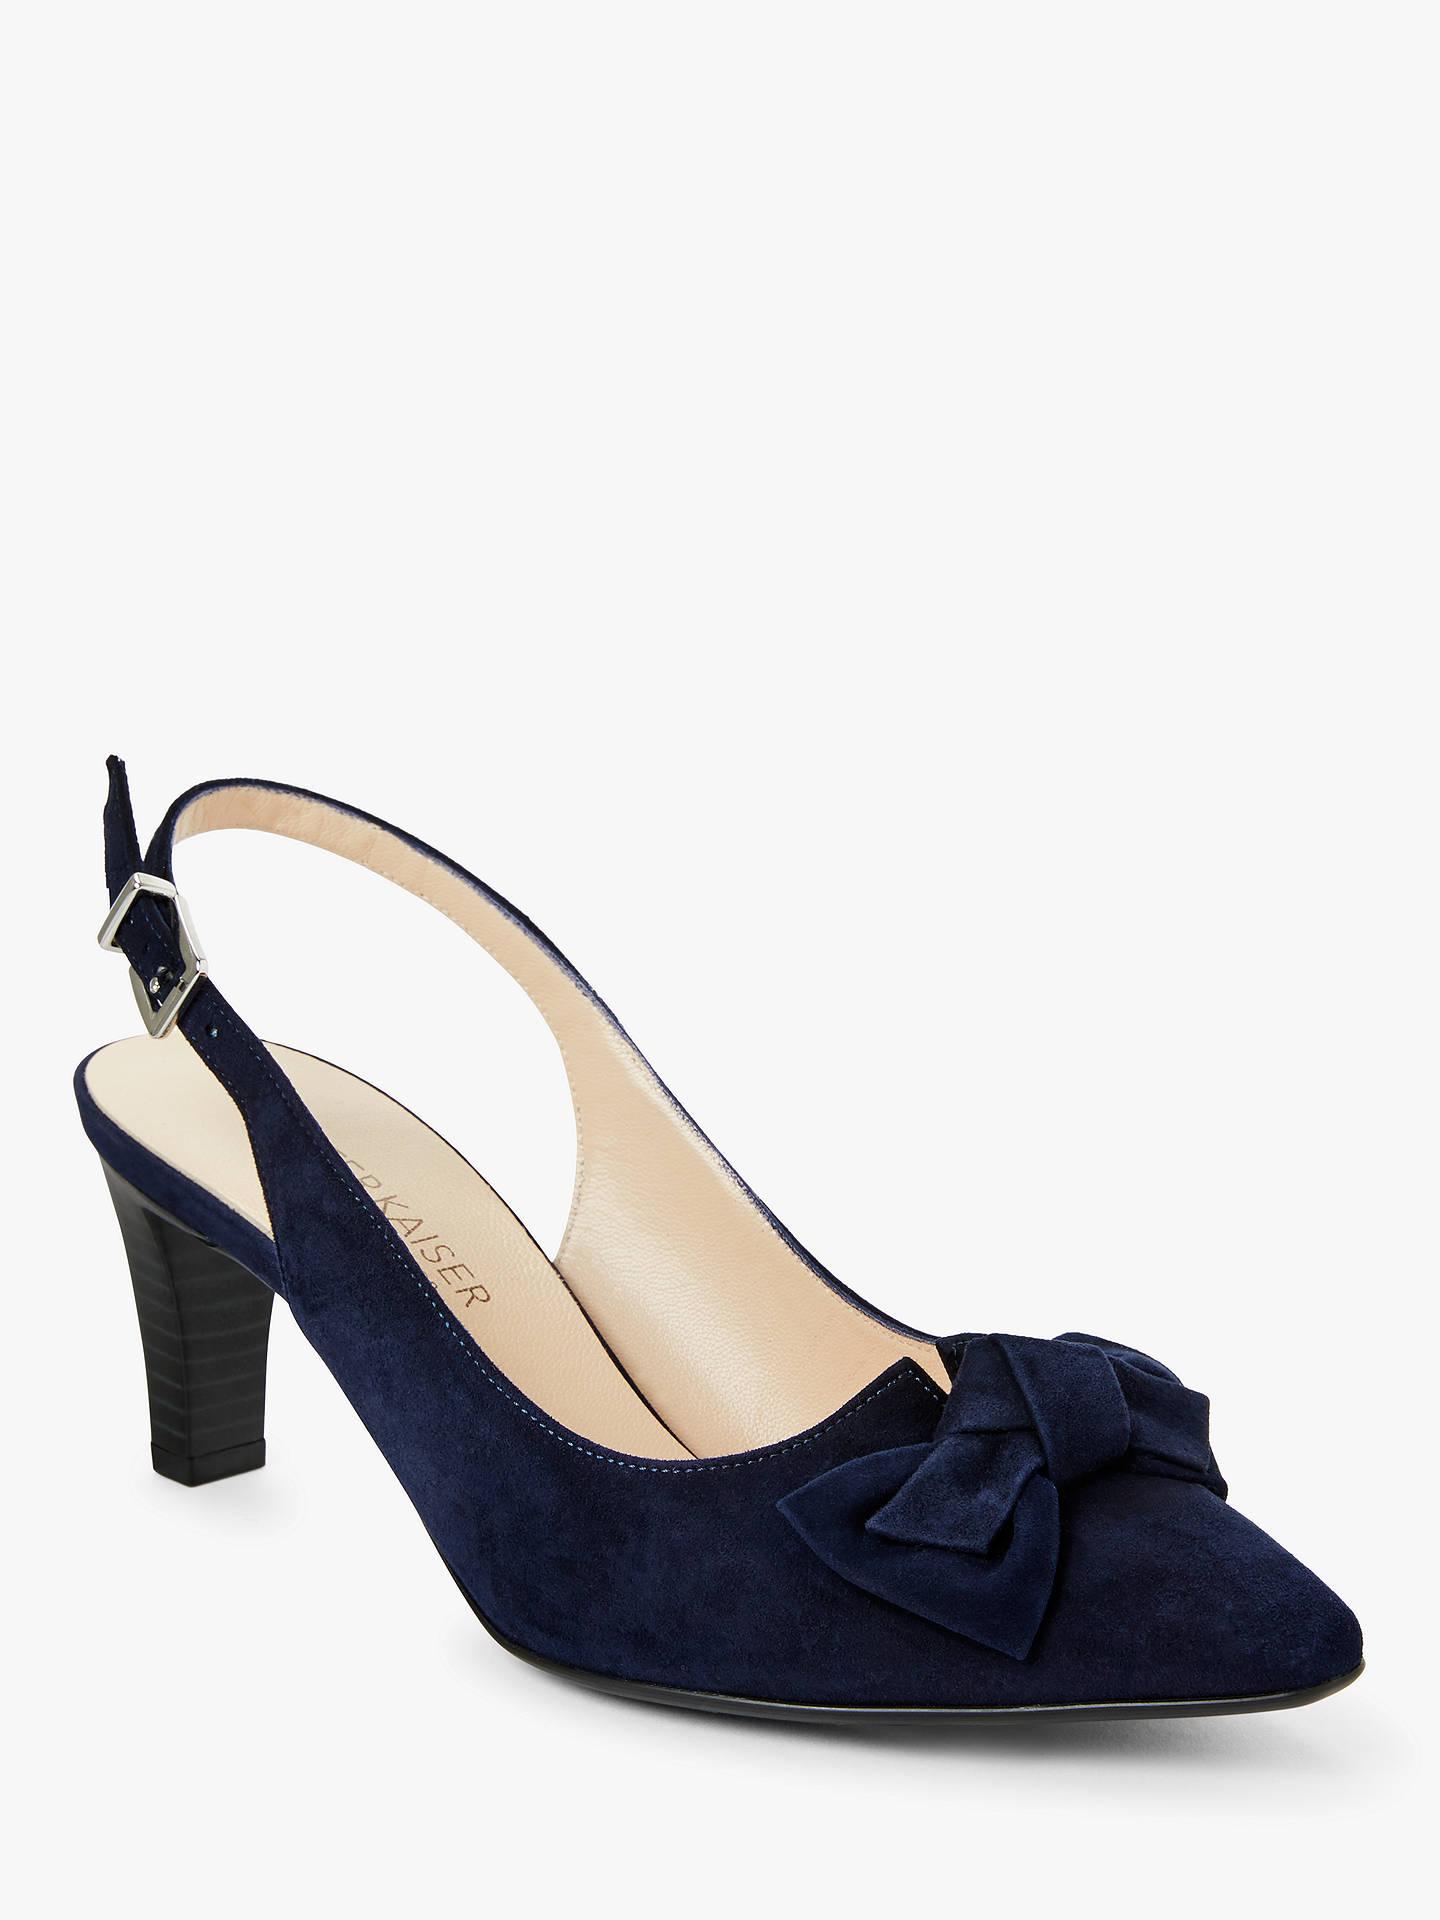 innovative design 12f8a 78c04 Peter Kaiser Malijana Bow Cone Heel Slingback Court Shoes, Notte Suede